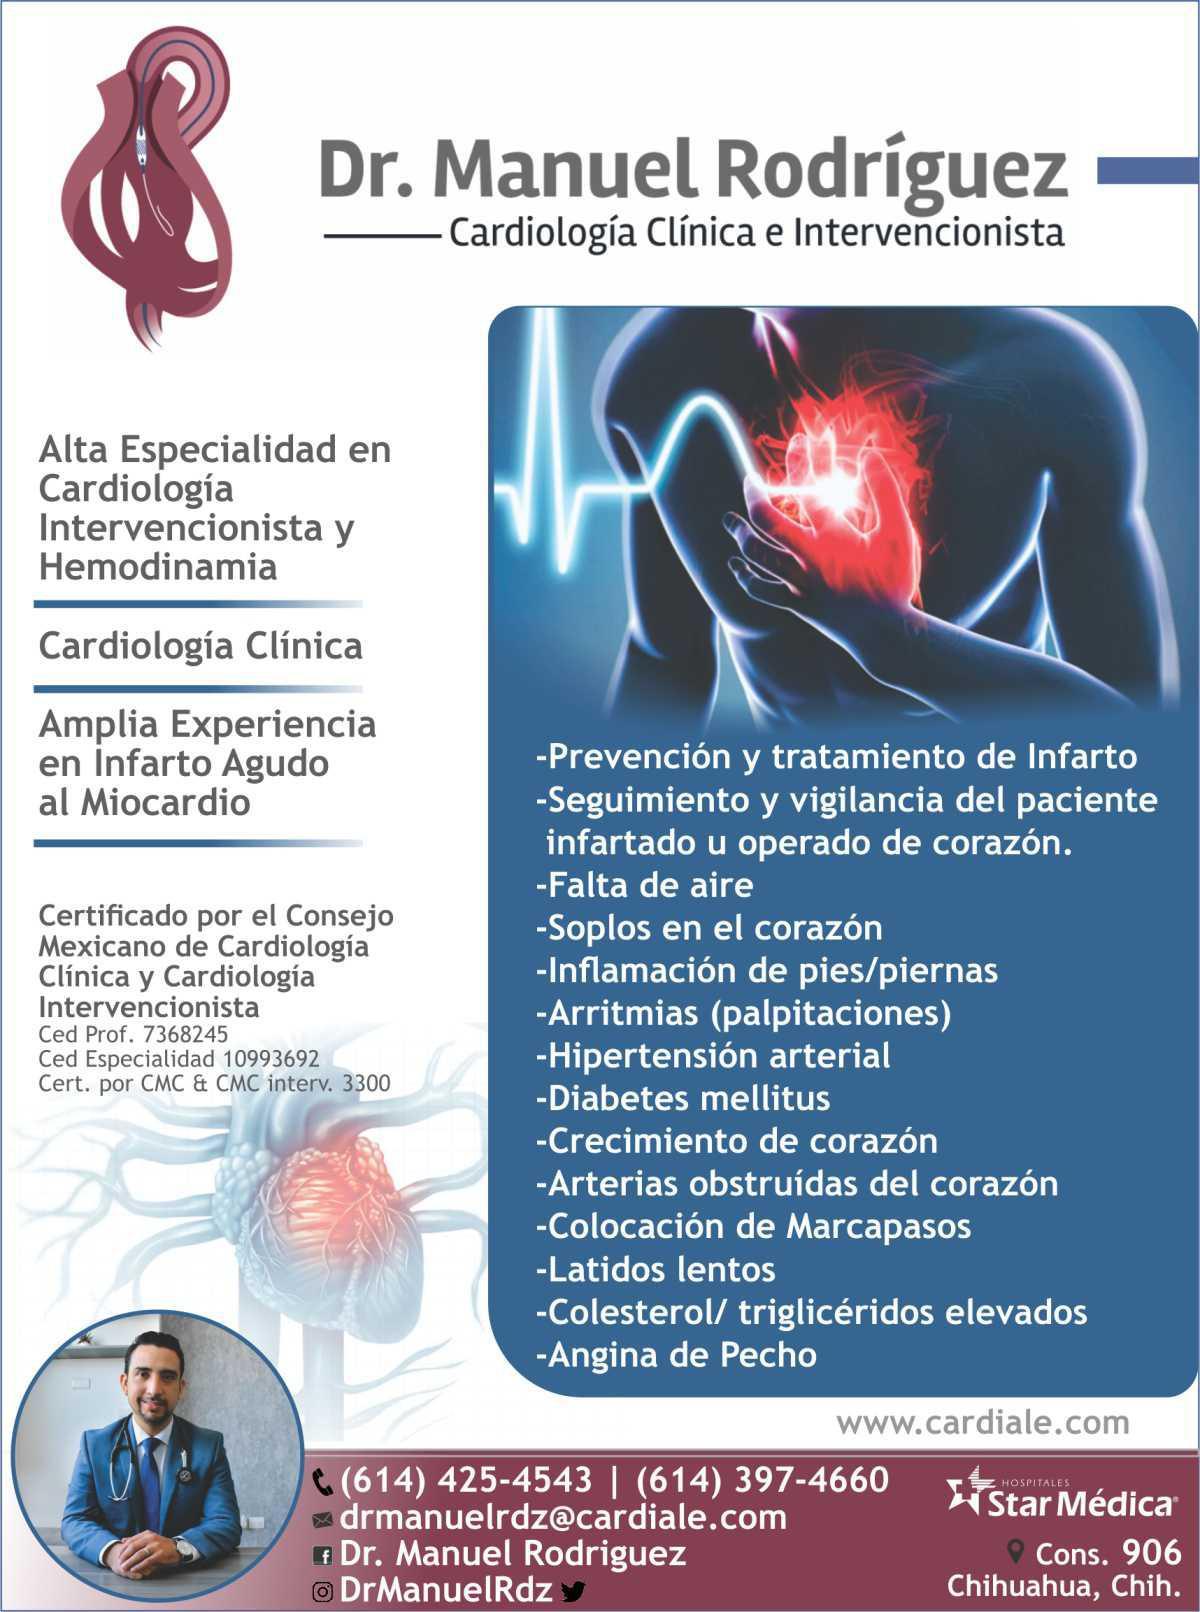 Dr. Manuel Rodriguez C.